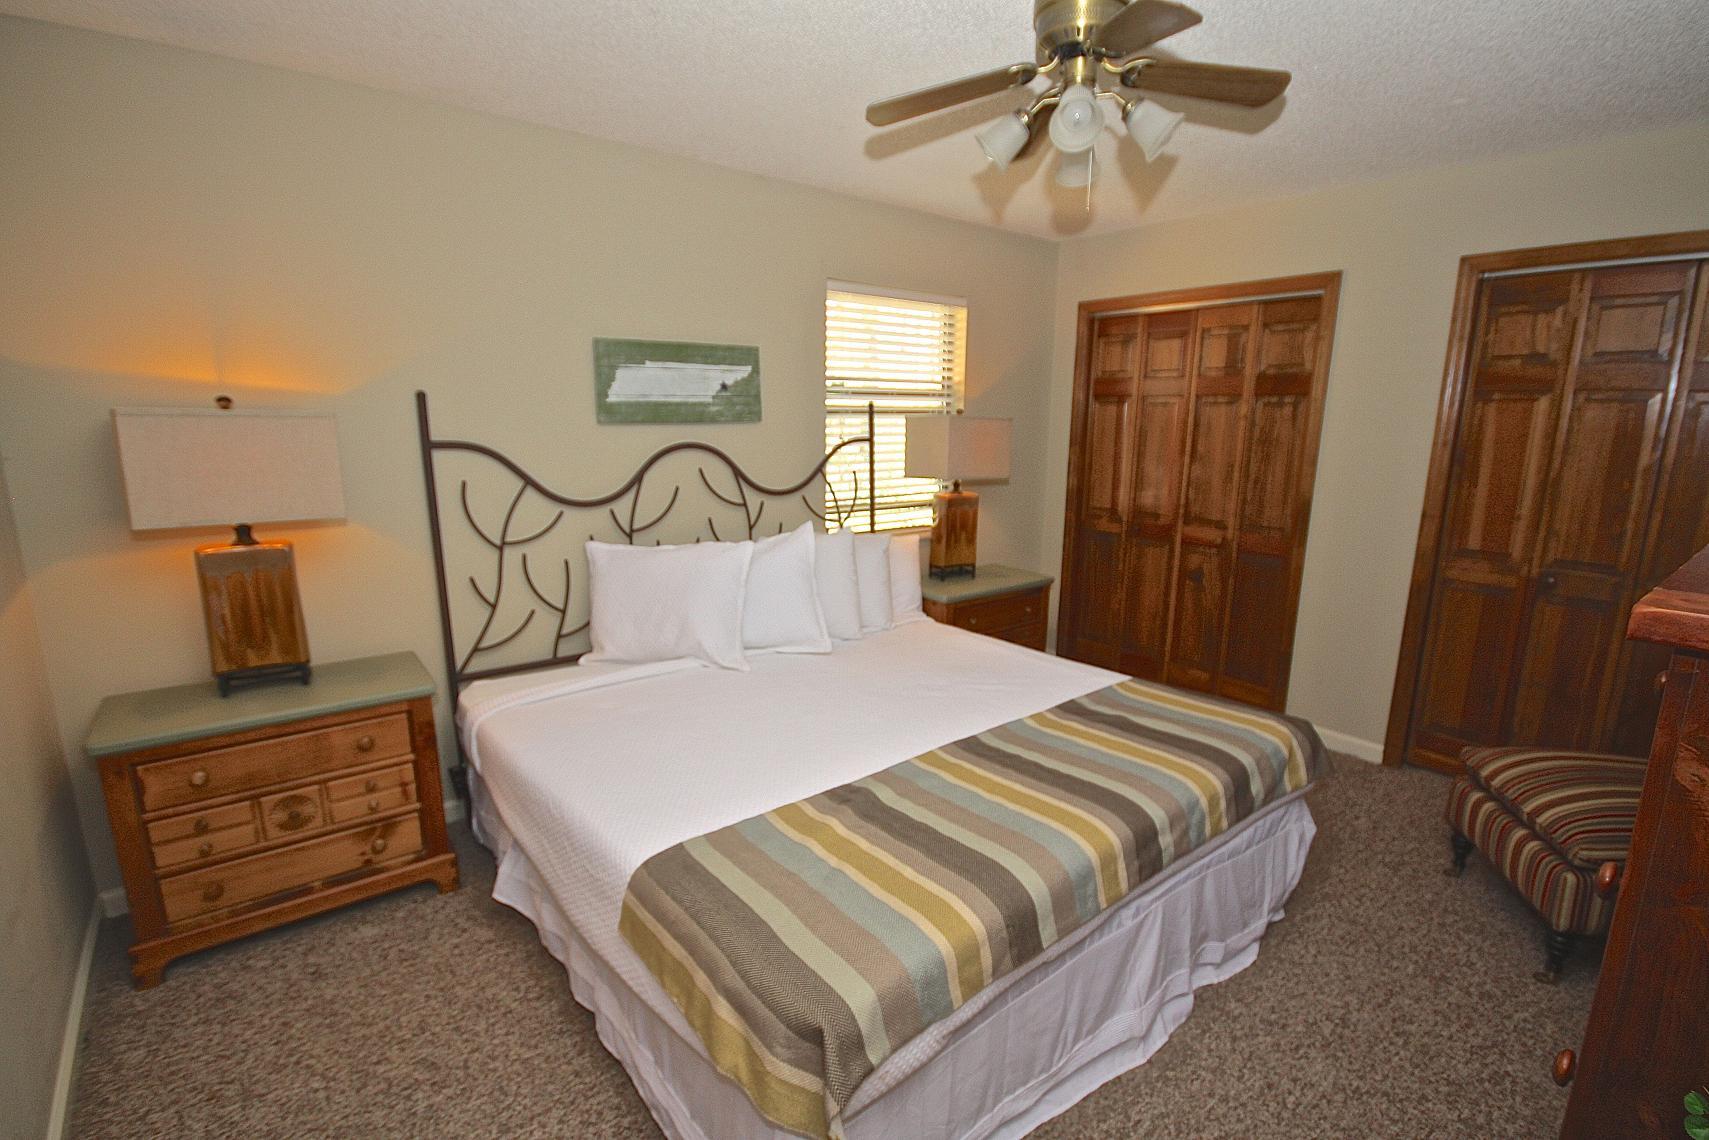 Greenbrier A 6 Bedroom Cabin In Gatlinburg Tennessee